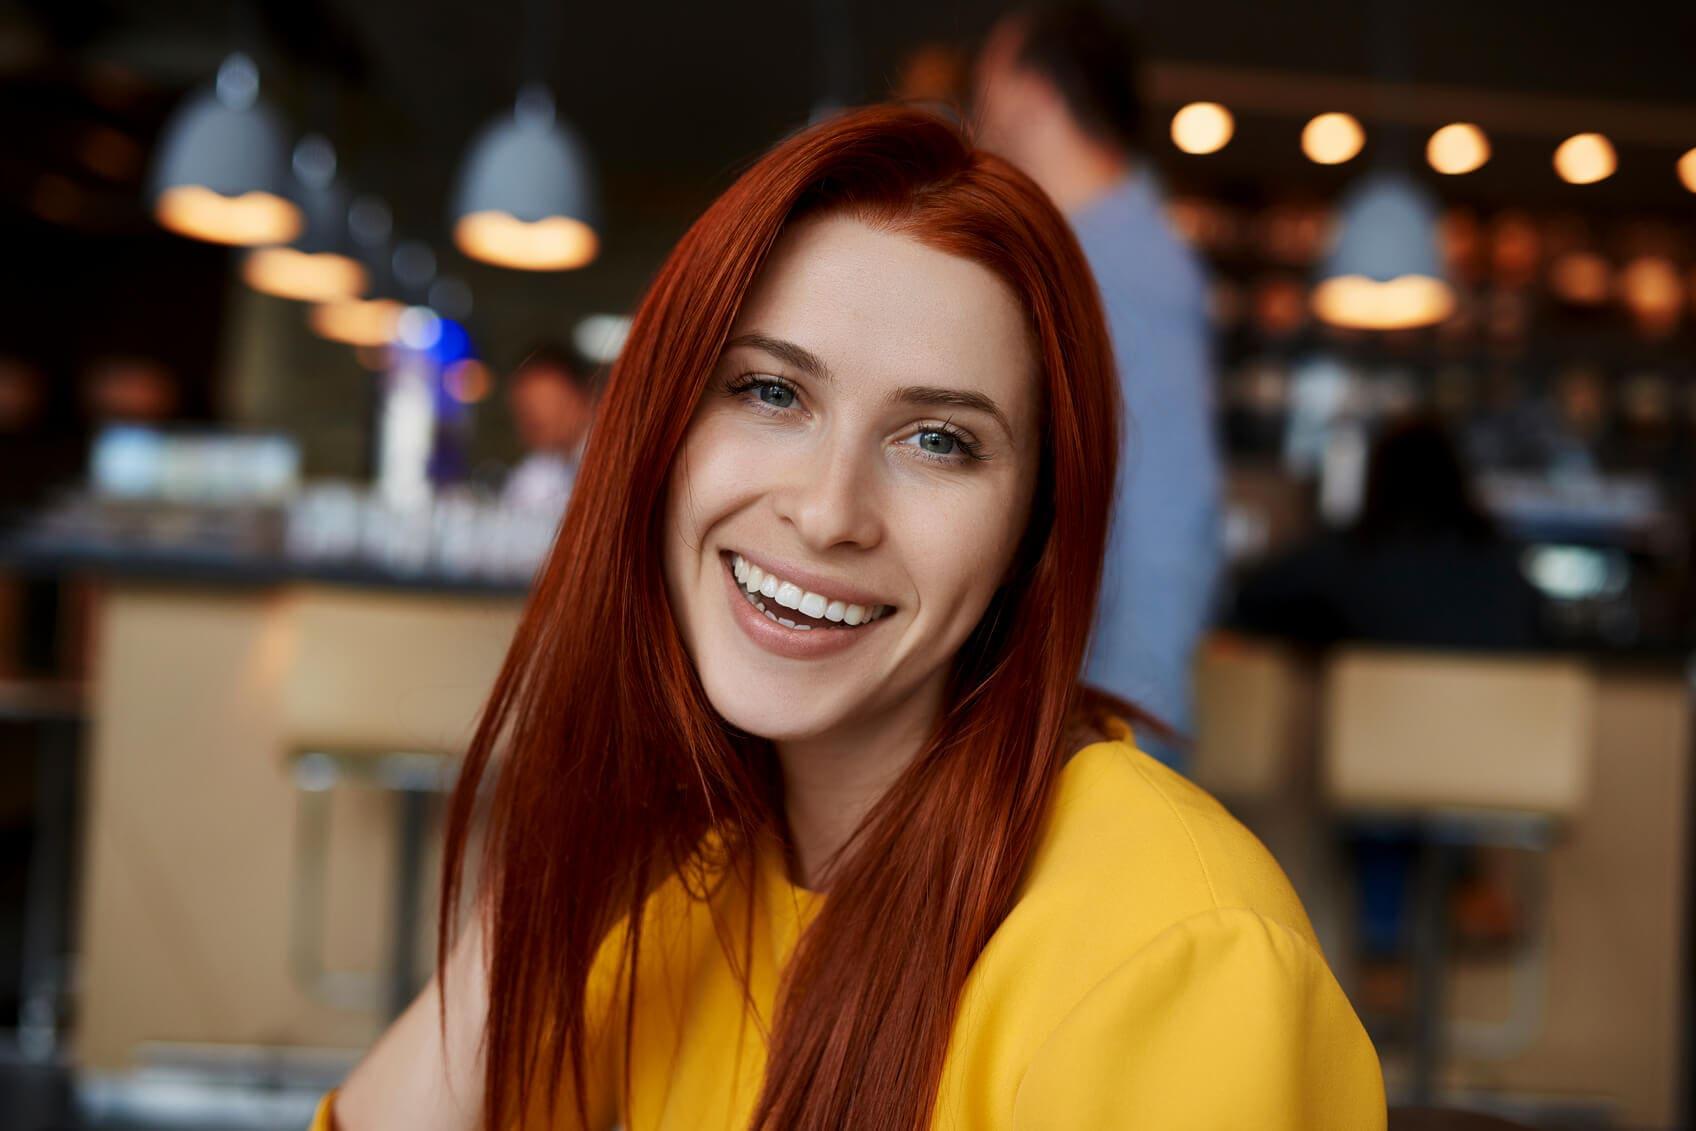 Beautiful women with blood orange hair worn in straight blowout